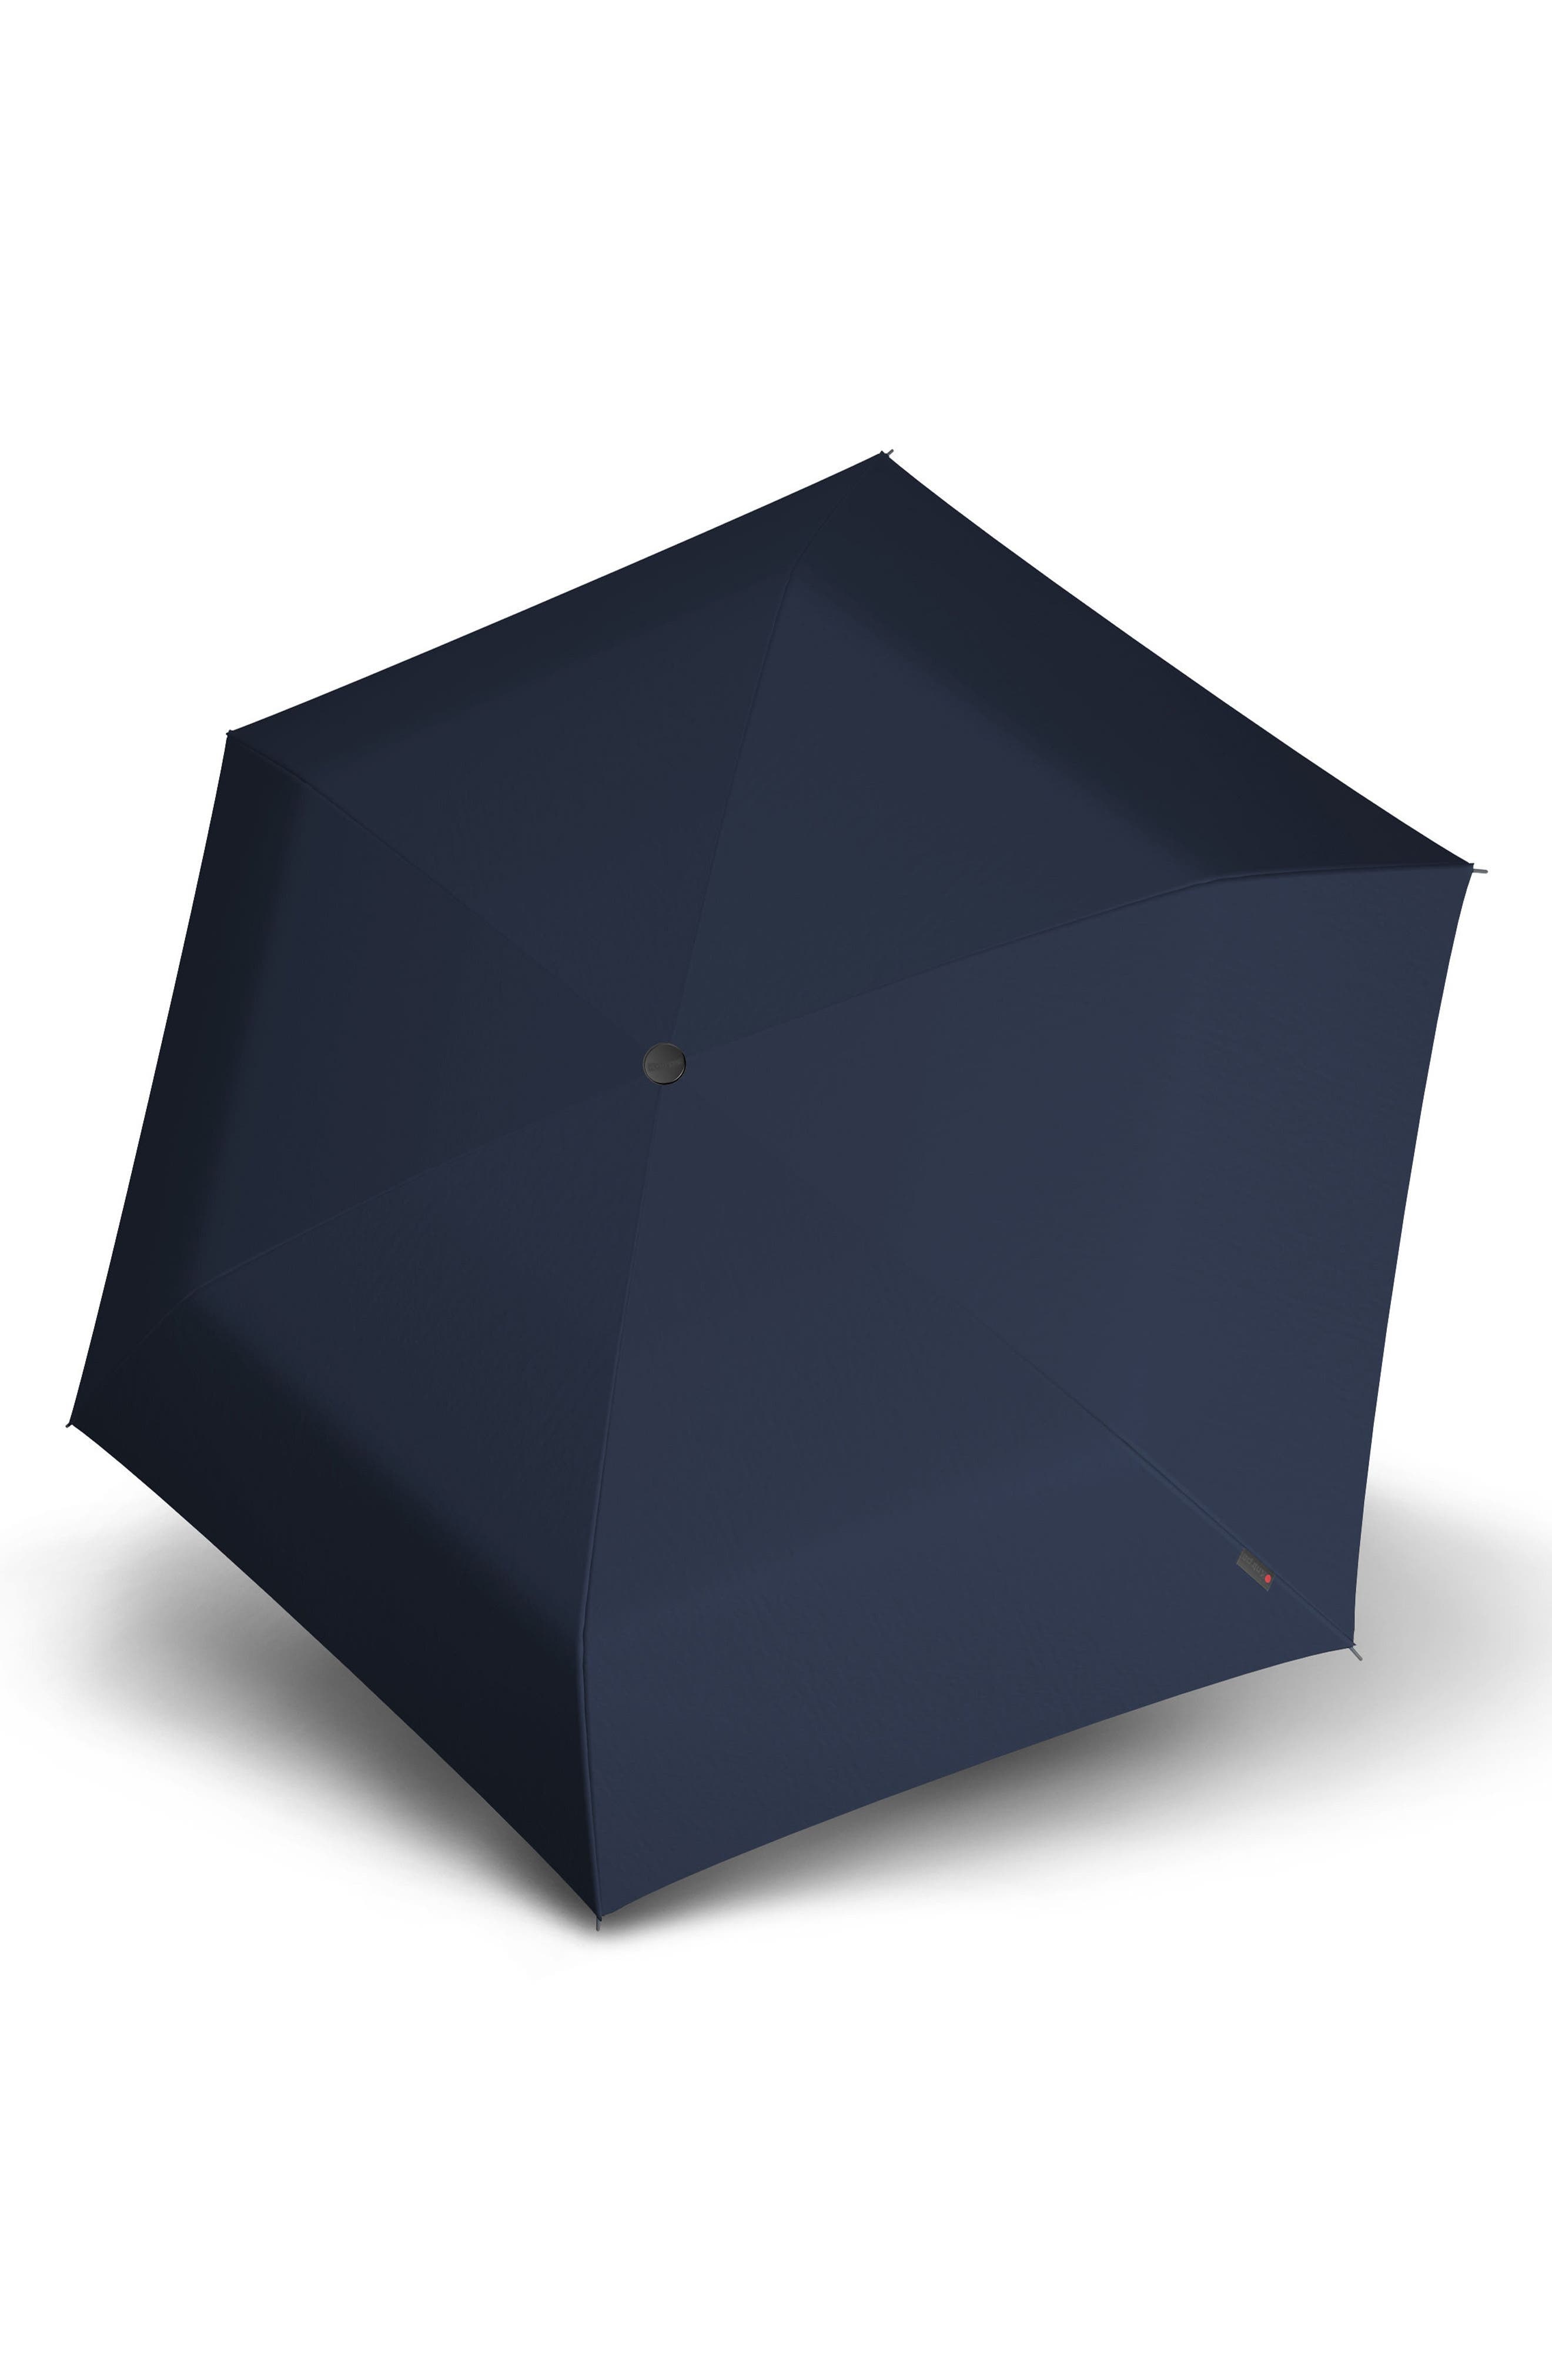 TS010 Slim Manual Open/Close Umbrella,                             Alternate thumbnail 2, color,                             Navy